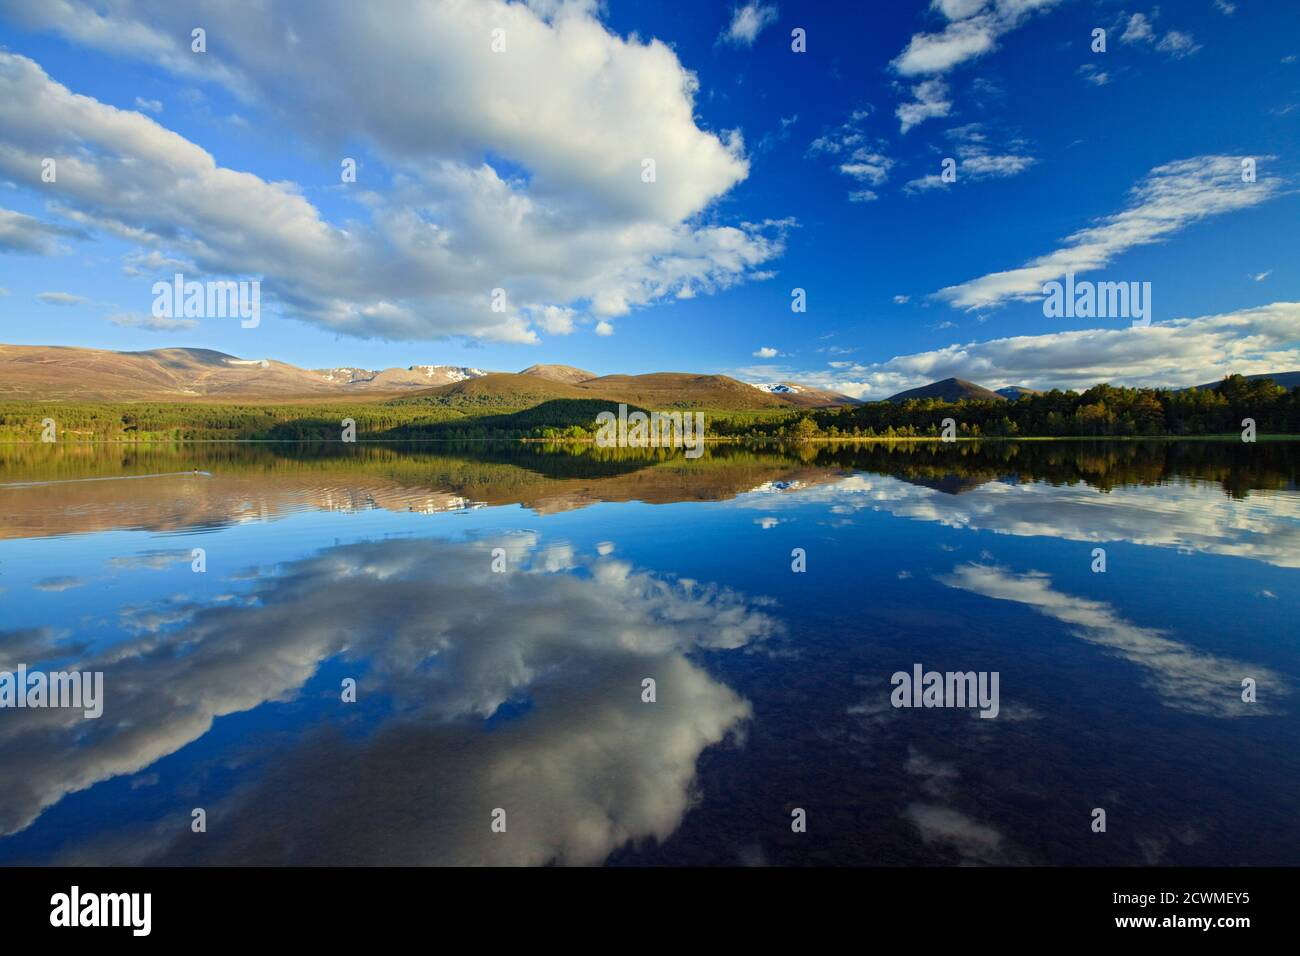 Loch Morlich, Badenoch and Strathspey, Highlands, Scotland Stock Photo